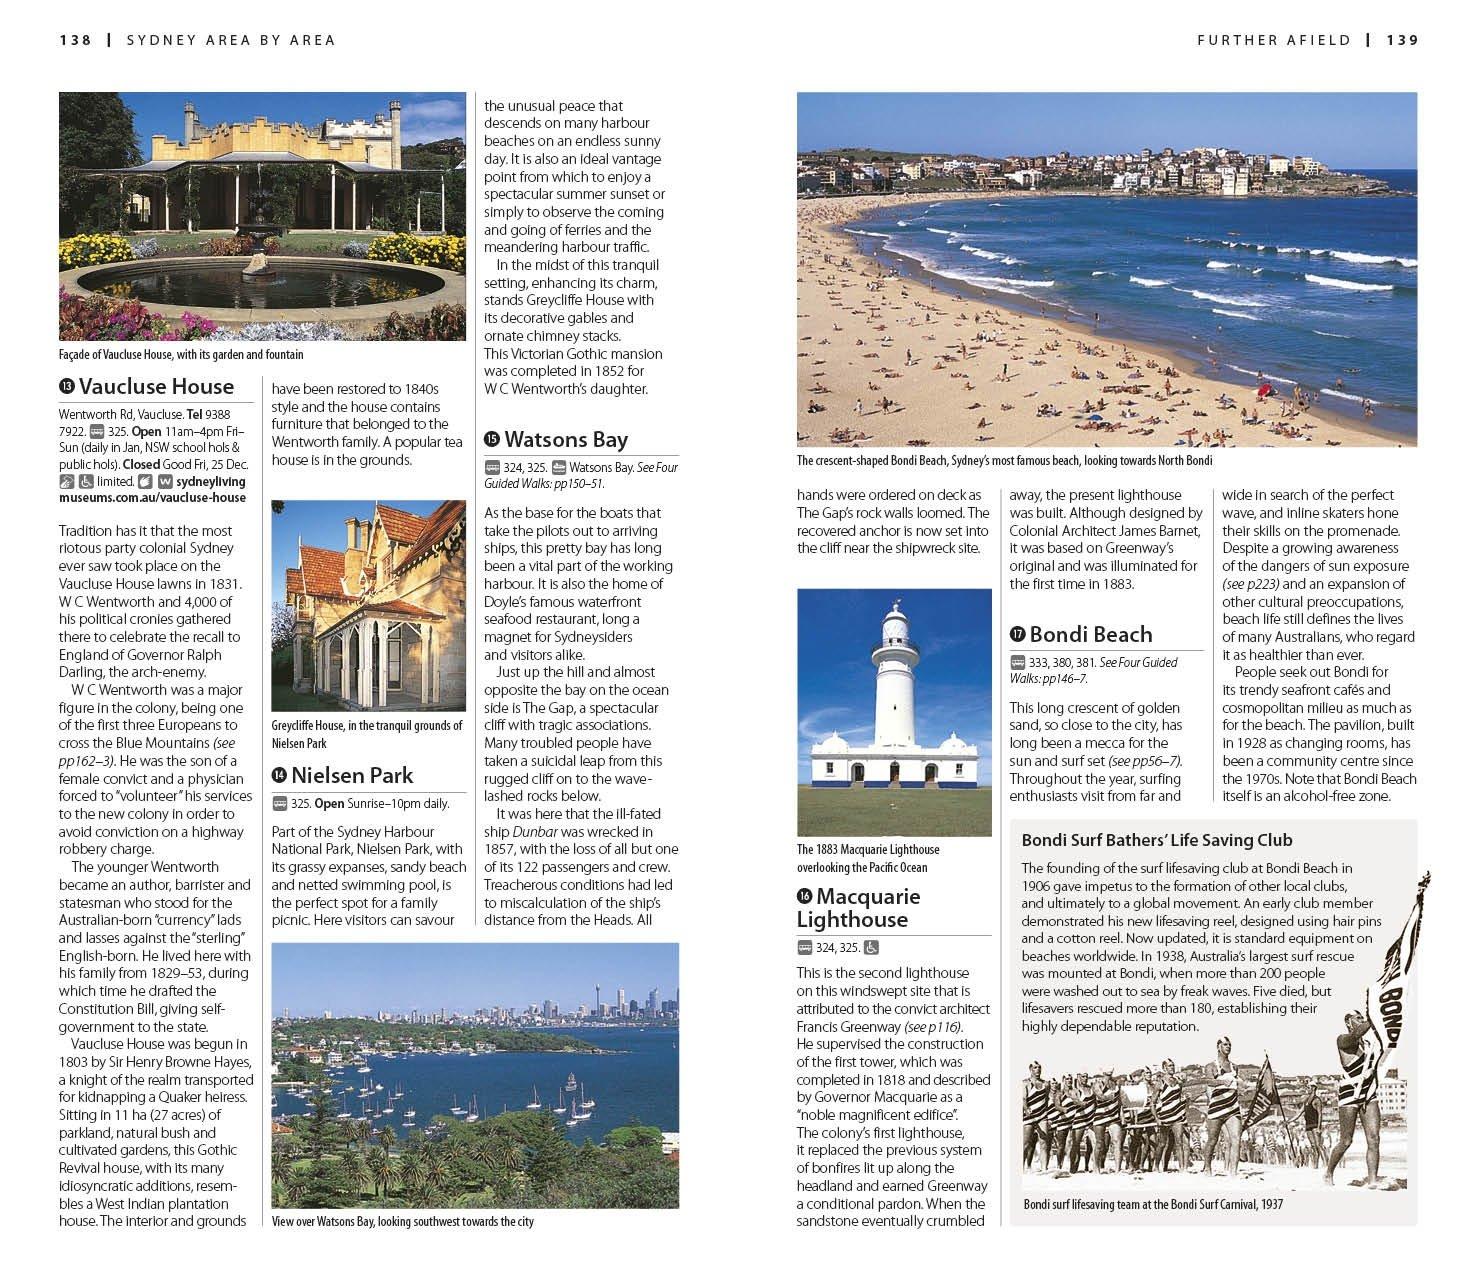 DK Eyewitness Travel Guide Sydney - 81eJJ6gPN0L - Getting Down Under